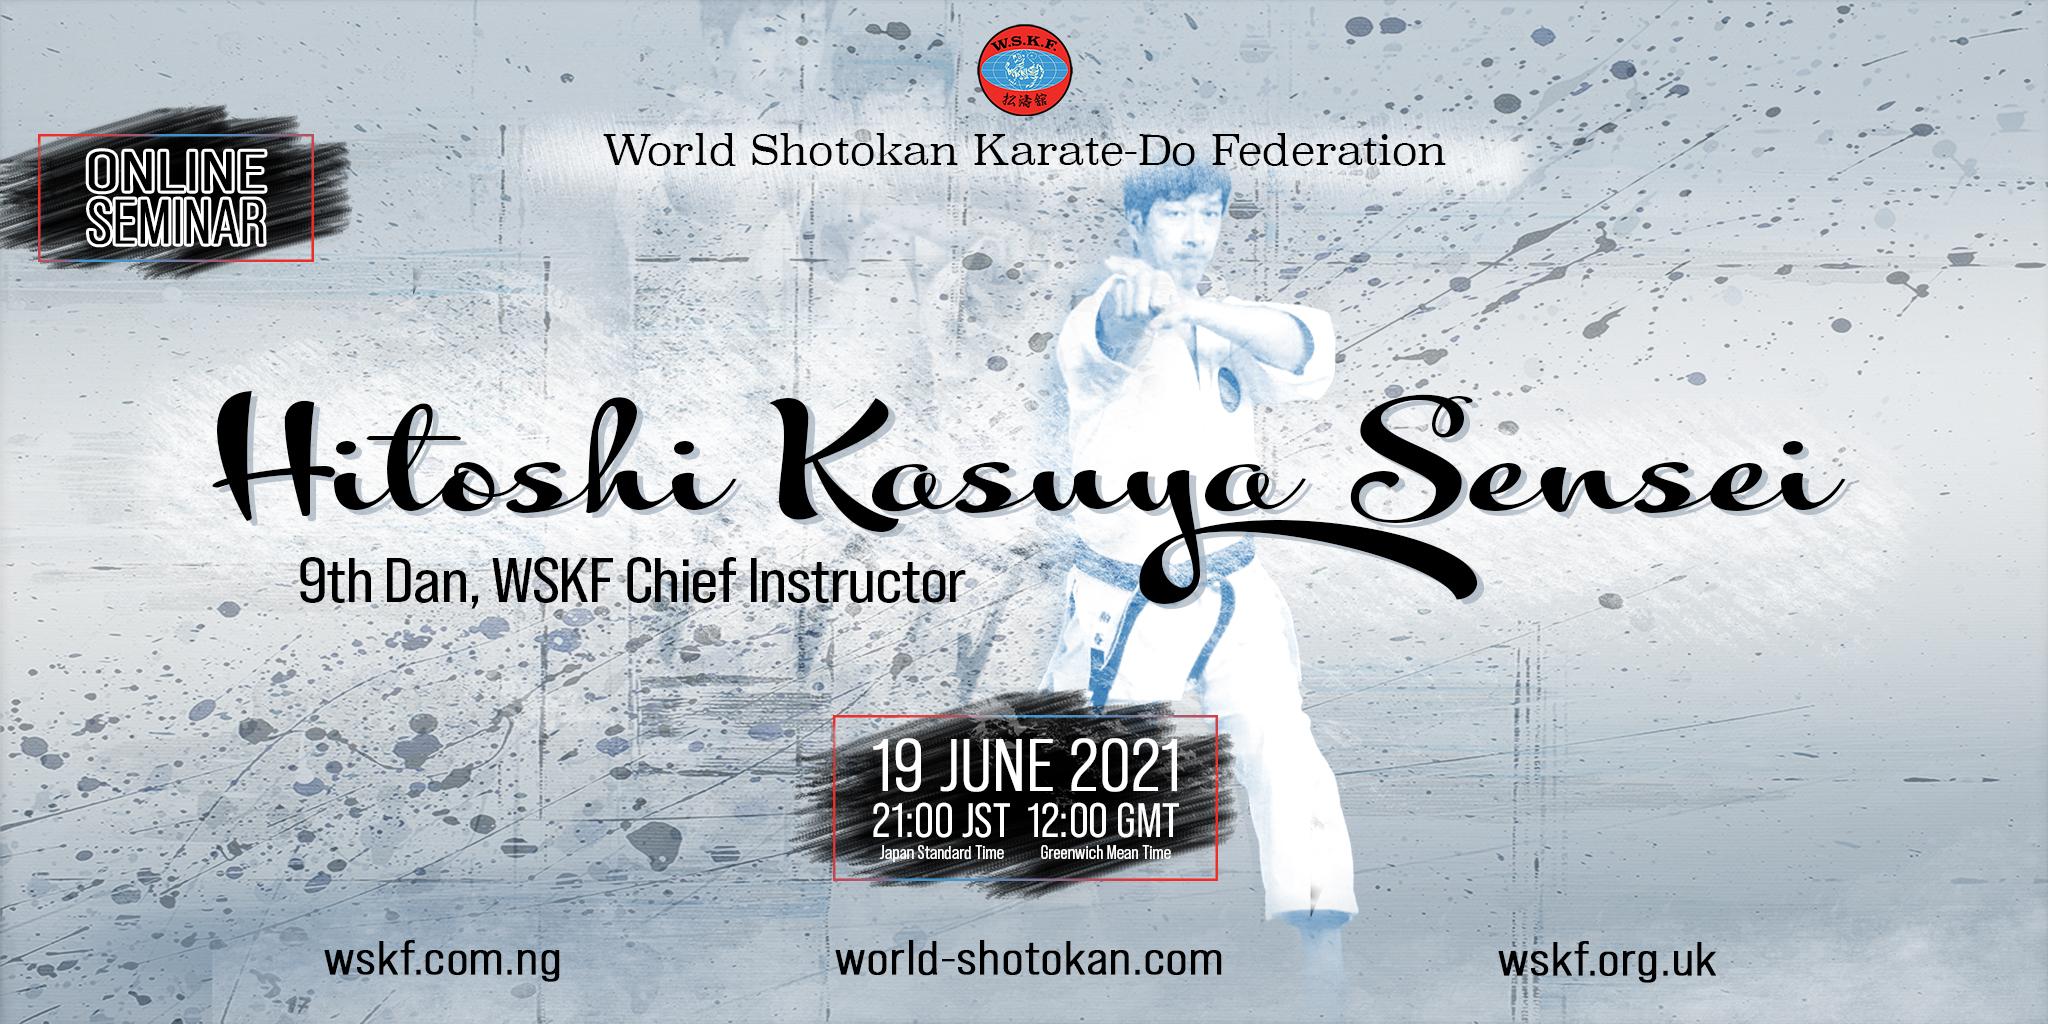 hitoshi_kasuya_online_seminar_20210619_2048x2014